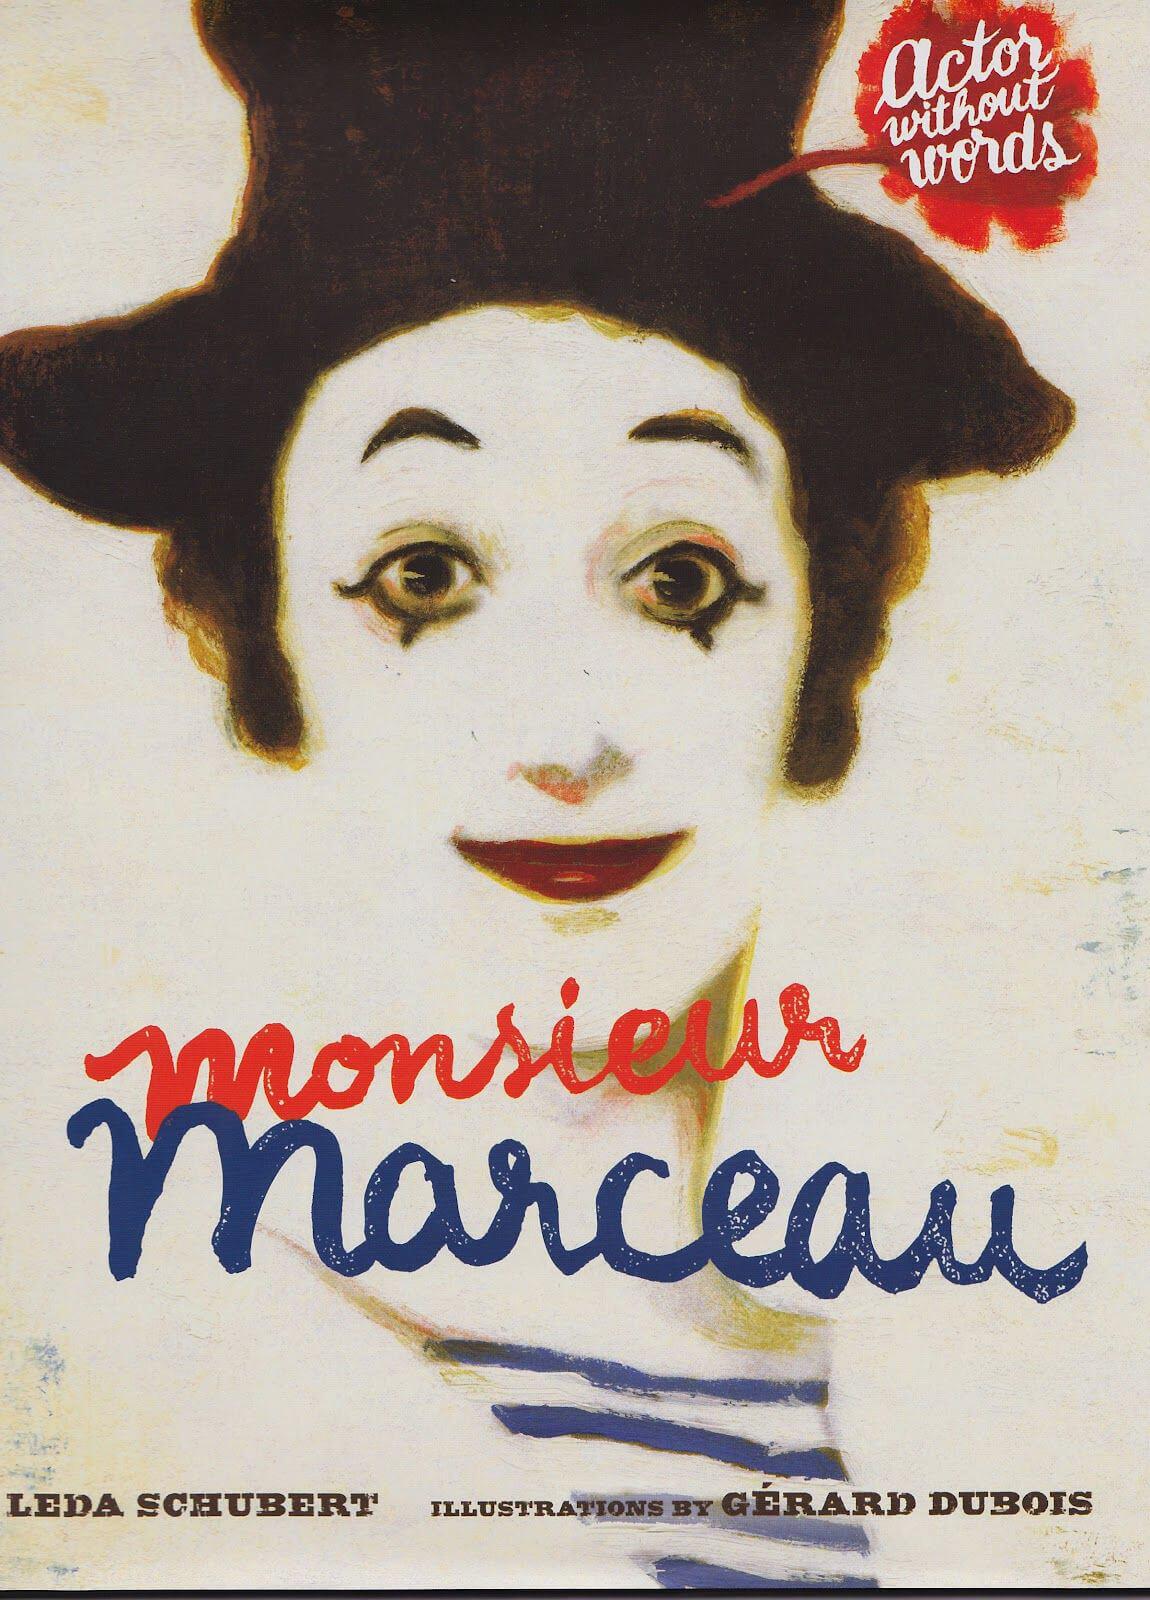 Runway-Magazine-affiche-mime-marceau